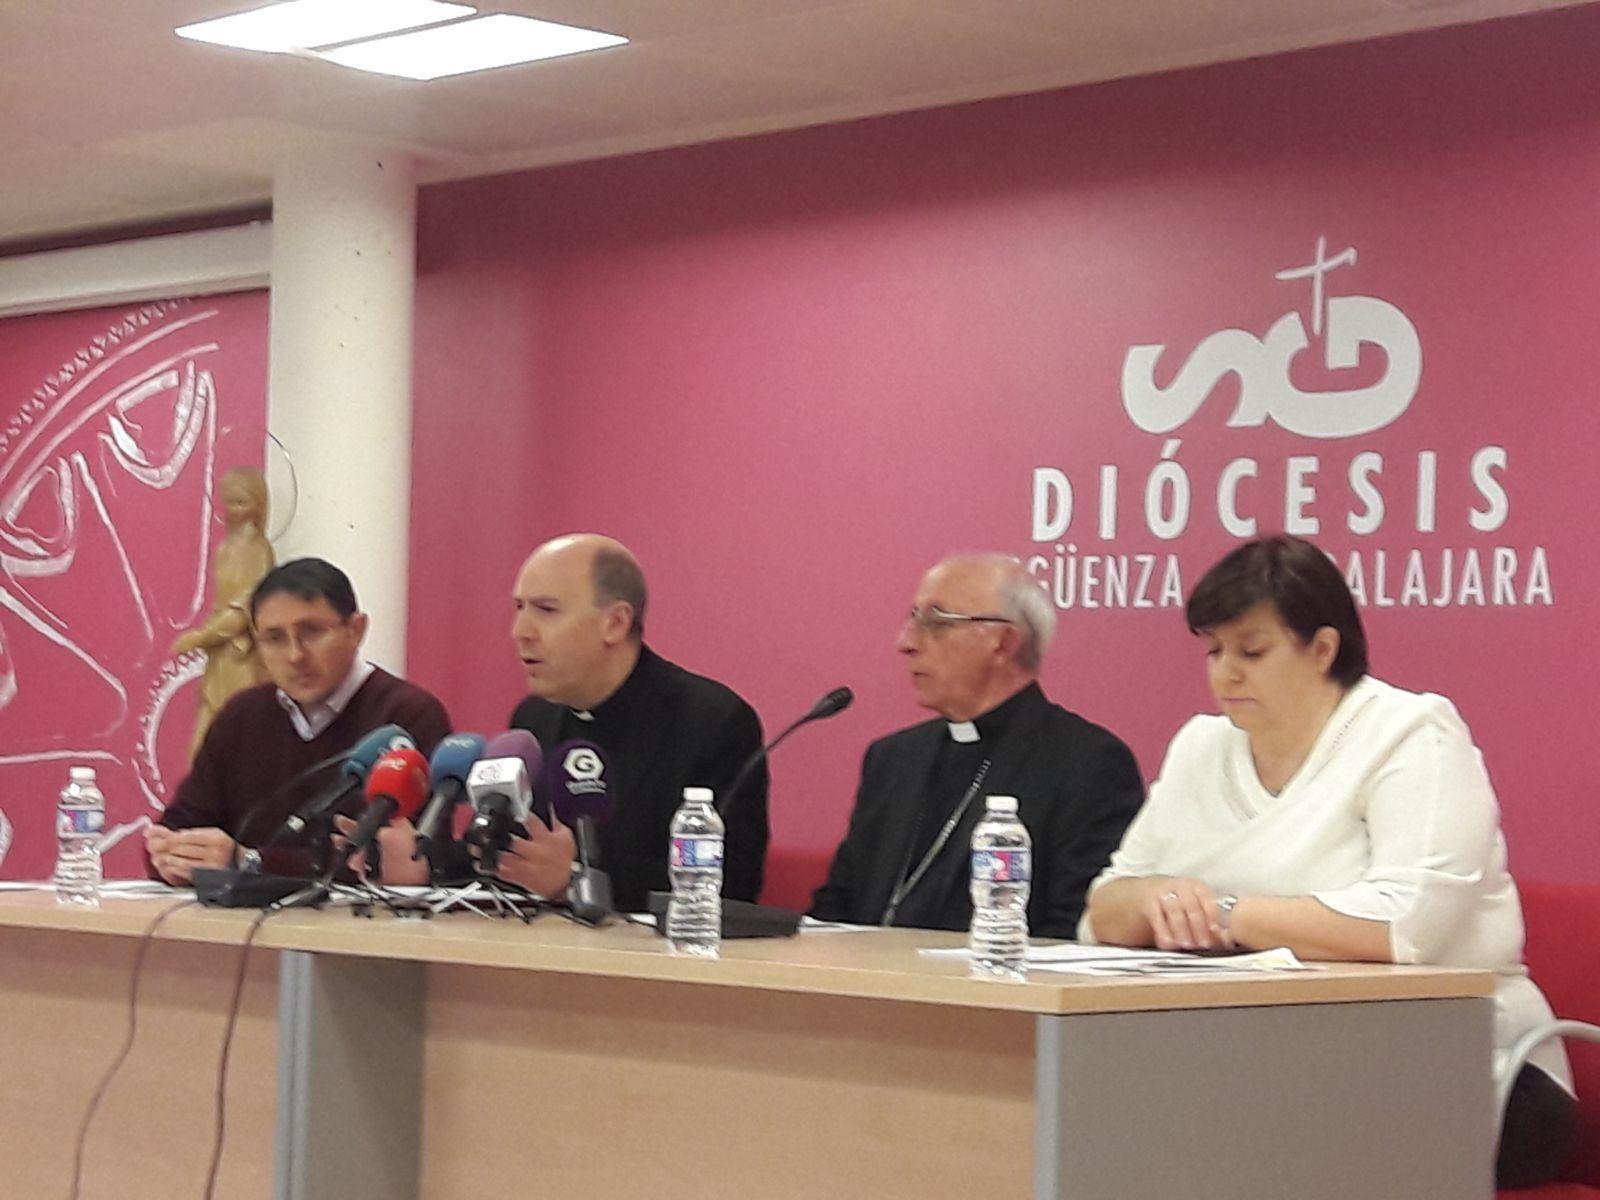 Un momento de la rueda del prensa del Obispo de la Diócesis